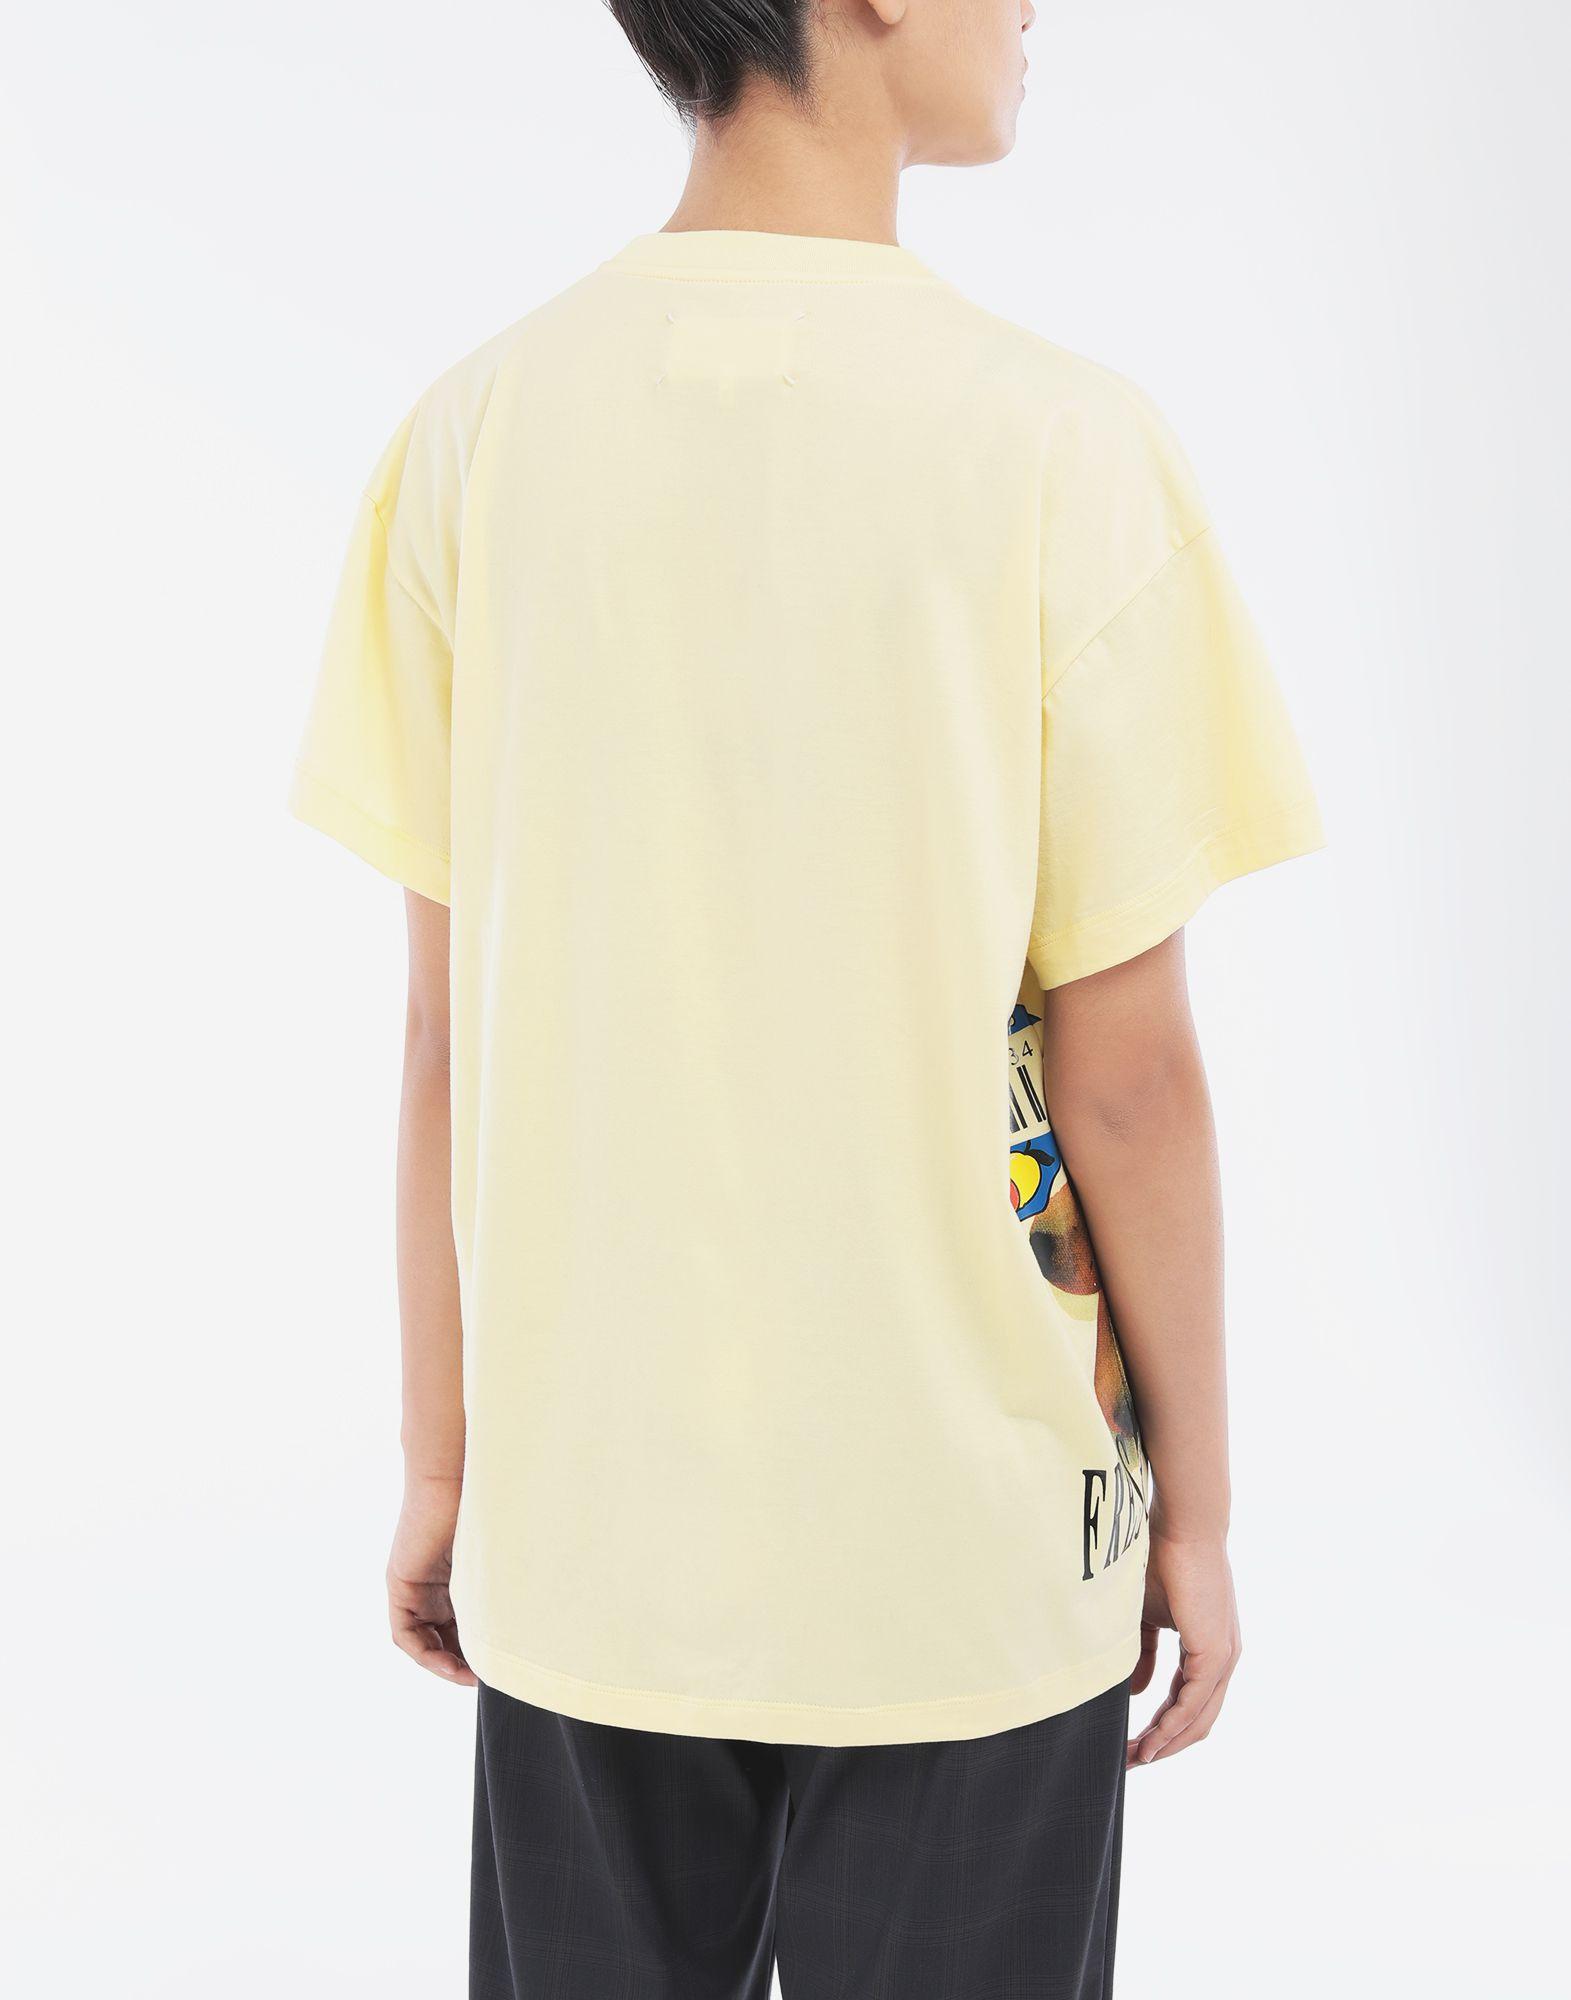 MAISON MARGIELA Fruit T-shirt Short sleeve t-shirt Woman e